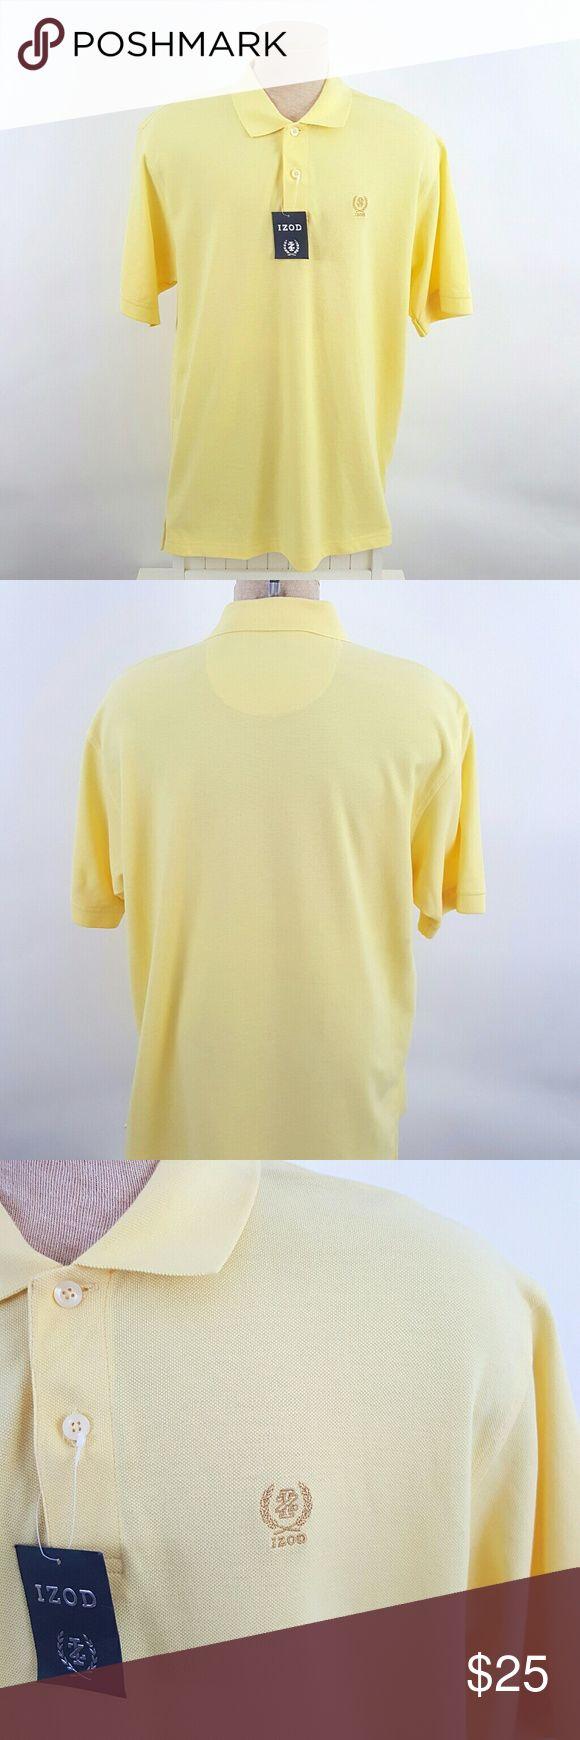 "NWT Men's Izod polo NWT Yellow polo shirt by Izod. Size XL. length 30.5"", Armpit to armpit 24"" (BM-BM1) Izod Shirts Polos"